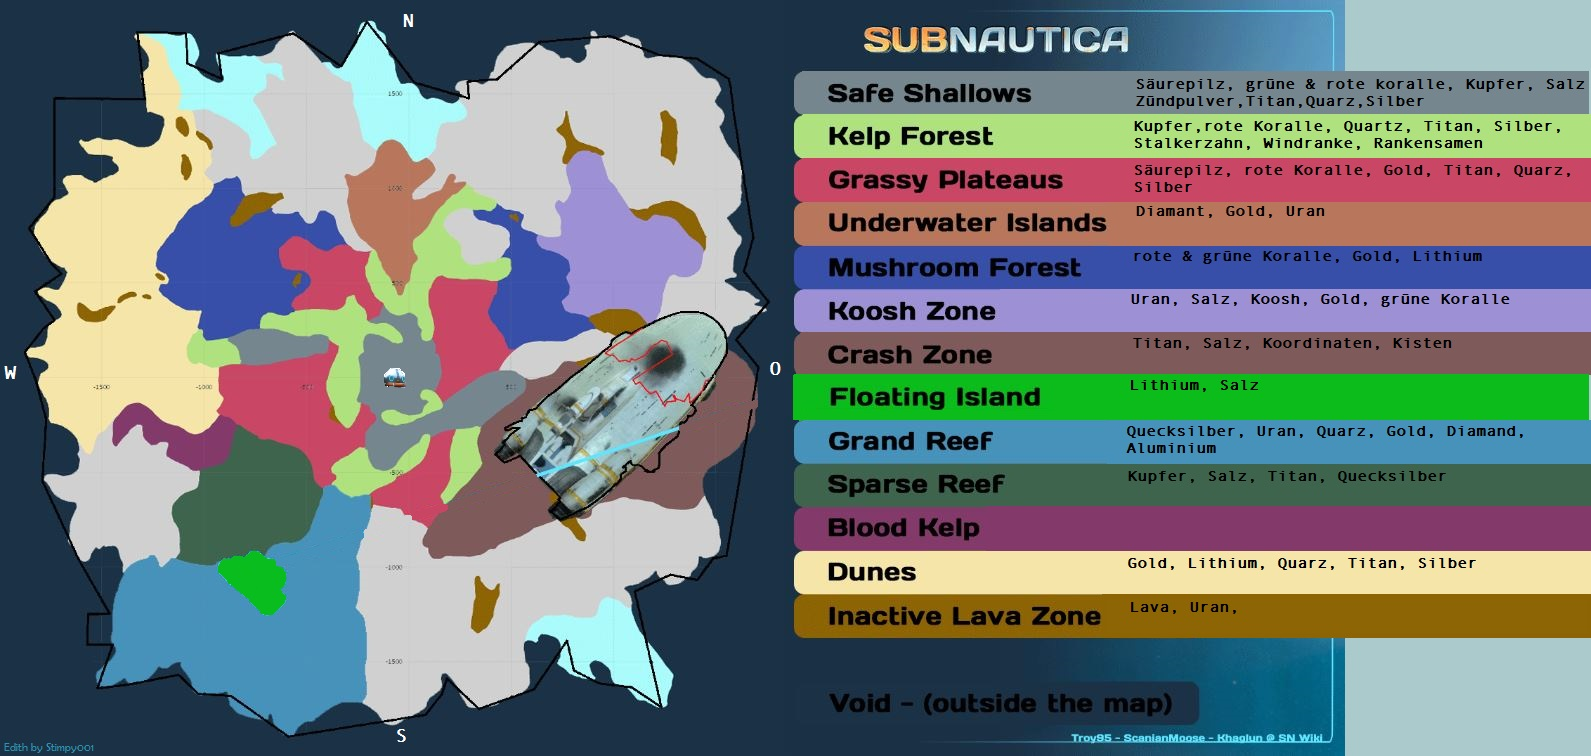 Subnautica Karte Deutsch.Diamant Karte Creactie